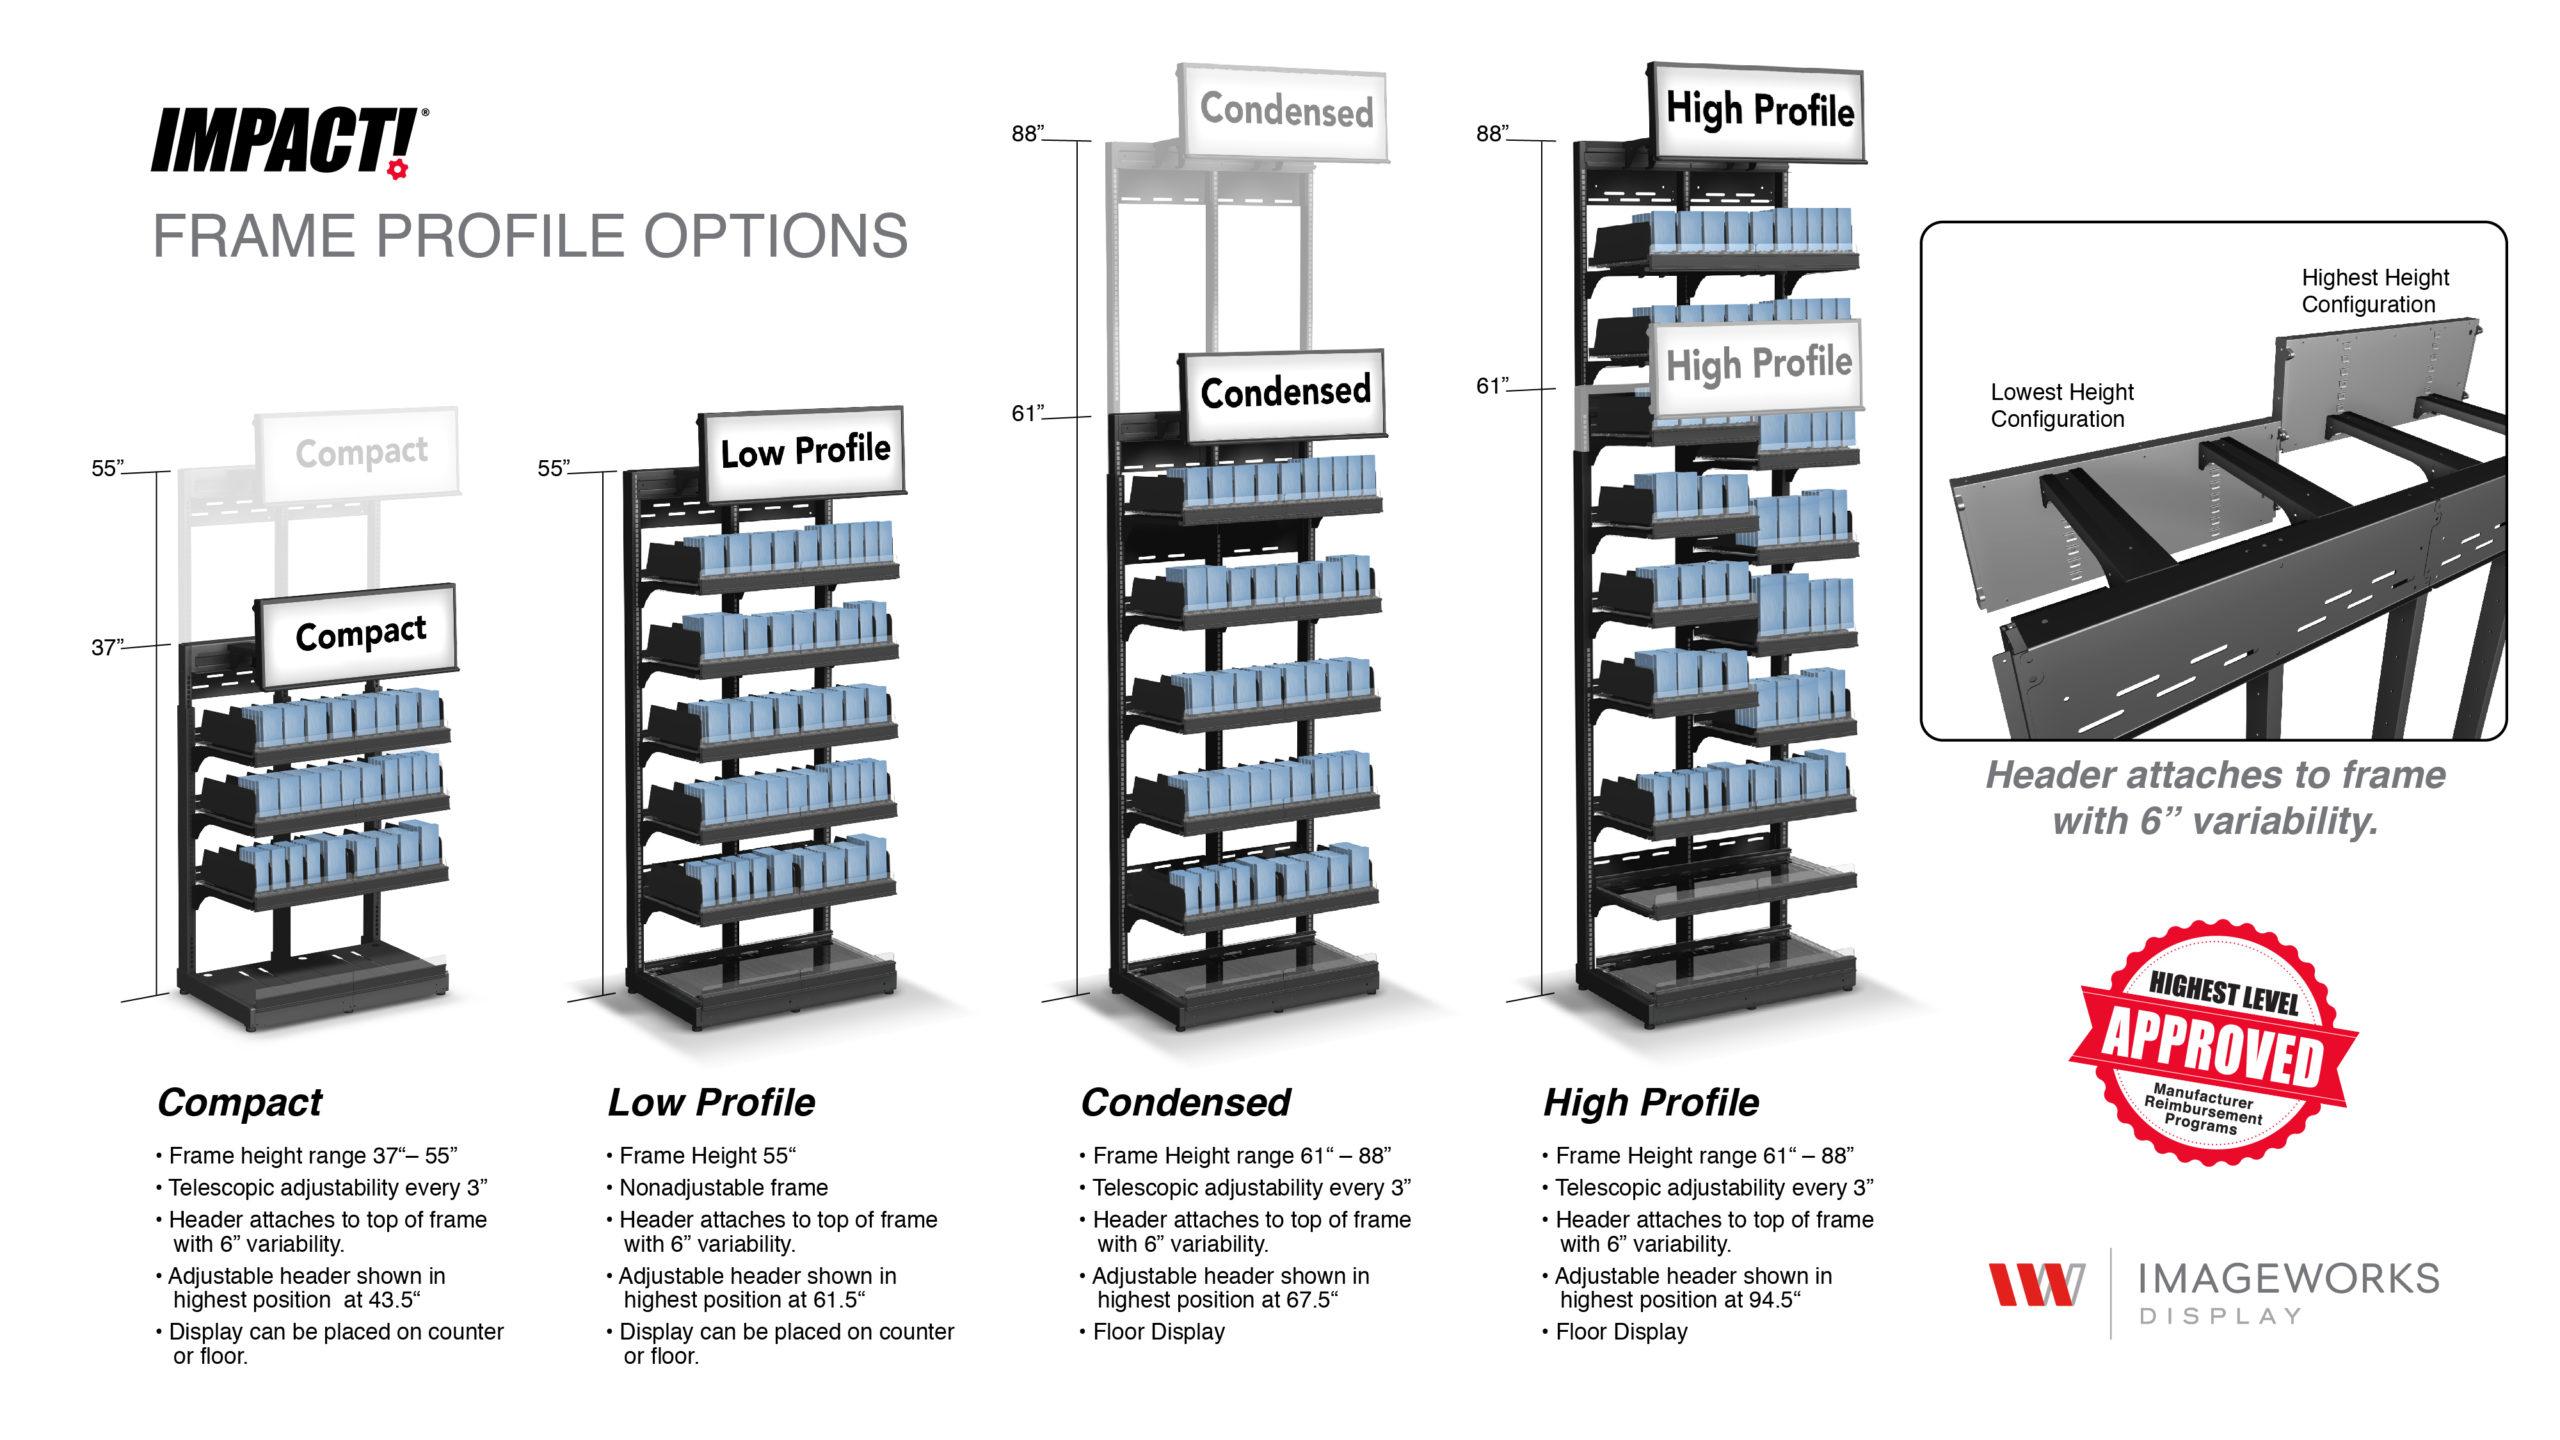 Display Height (Impact) Profile Options